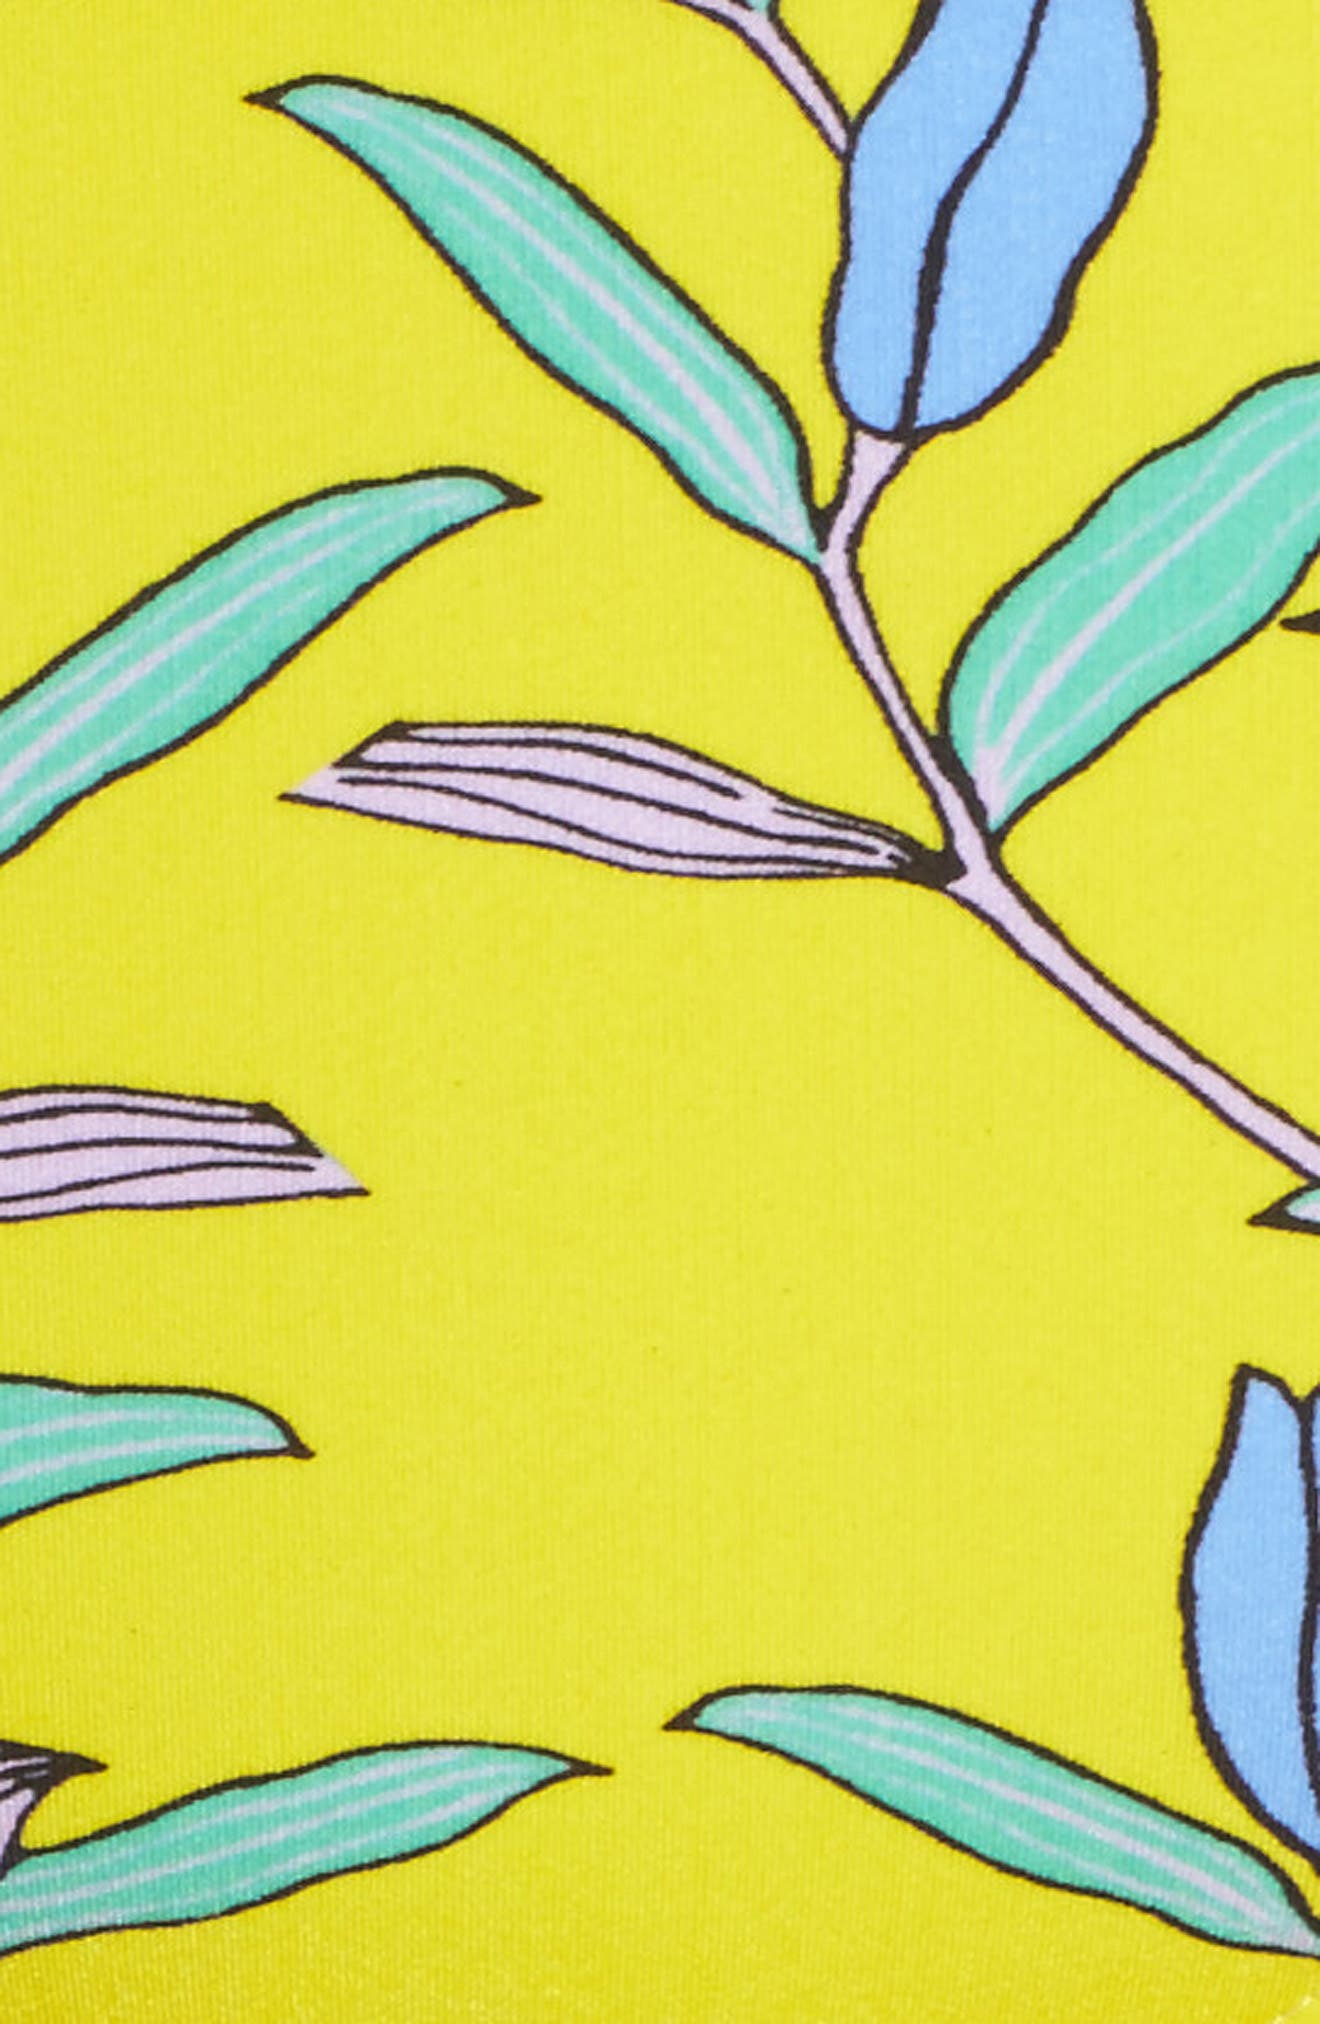 Mid Rise Cheeky Bikini Bottoms,                             Alternate thumbnail 8, color,                             Argos Small Allover Pineapple